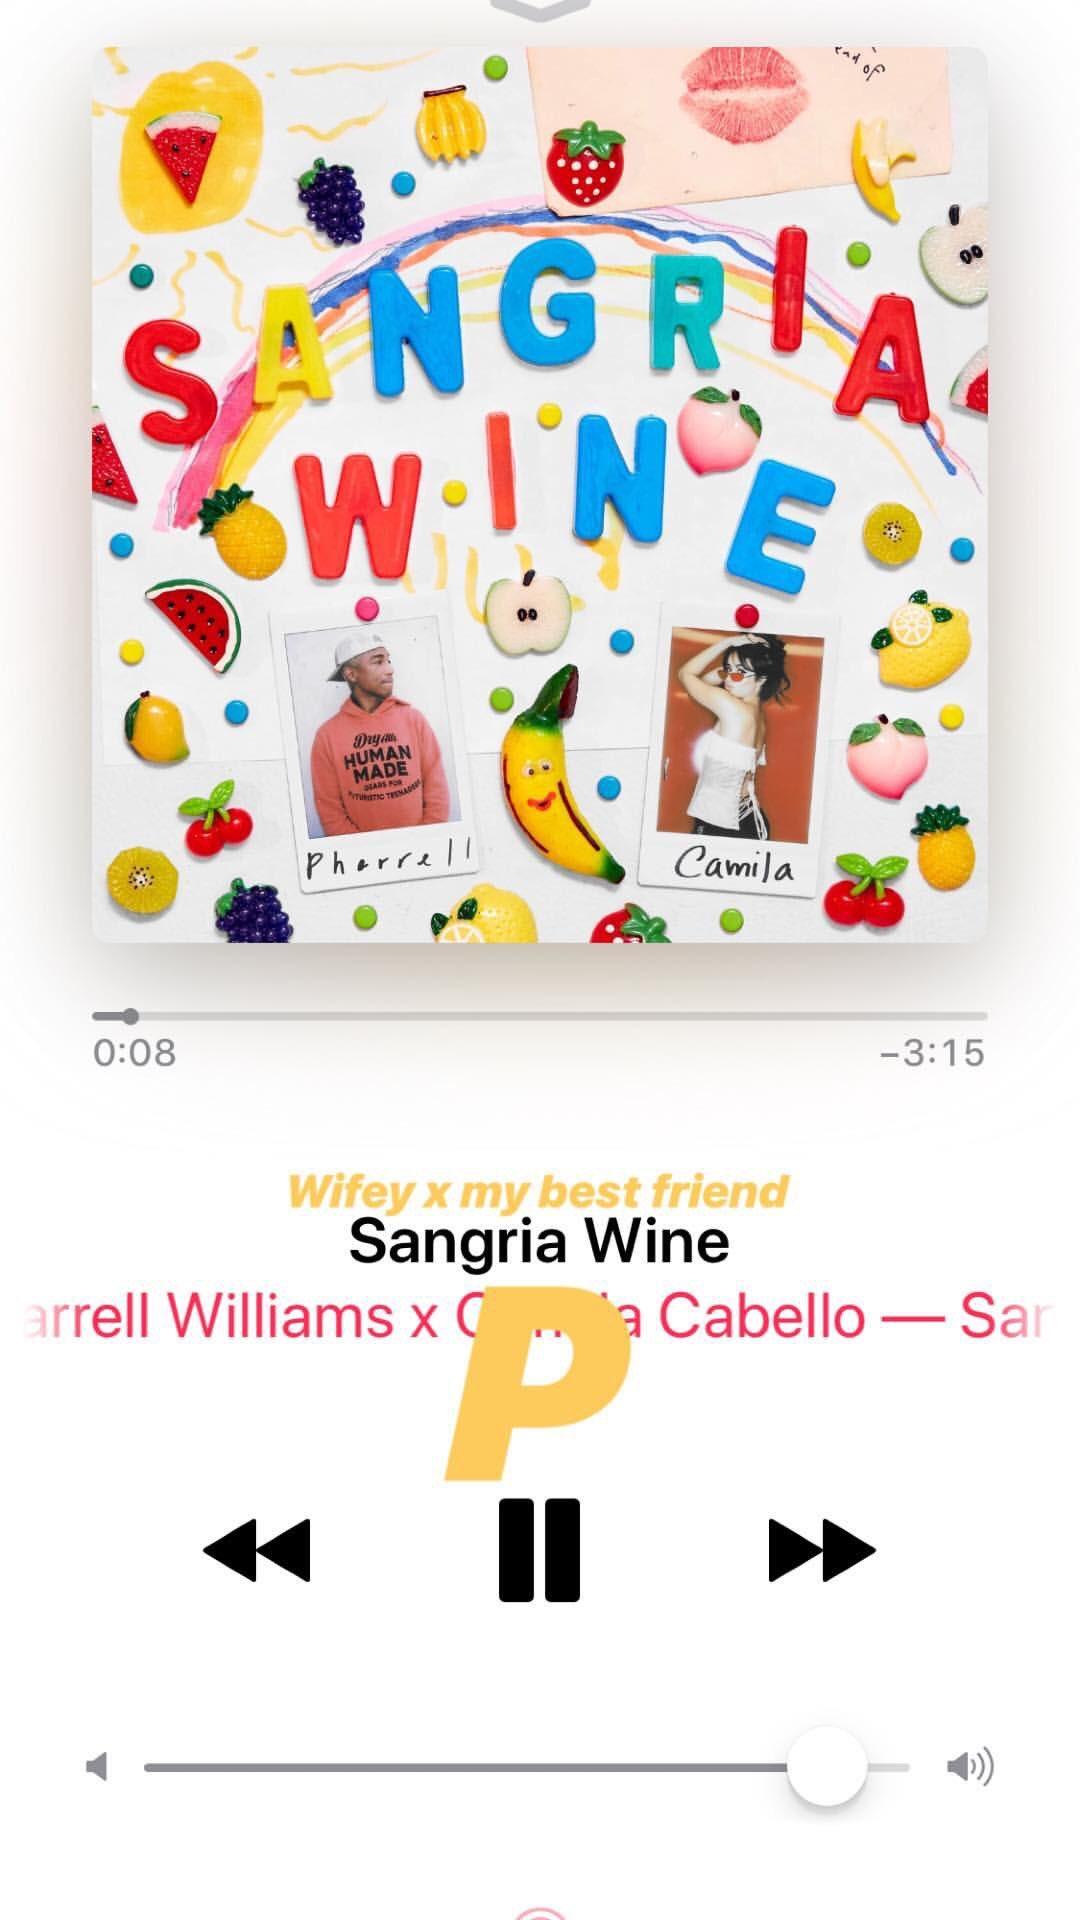 "Ariana praises Camila and Pharrell's Sangria Wine via her Instagram story �� ""wifey x my best friend"" https://t.co/d8EbaDr6vI"